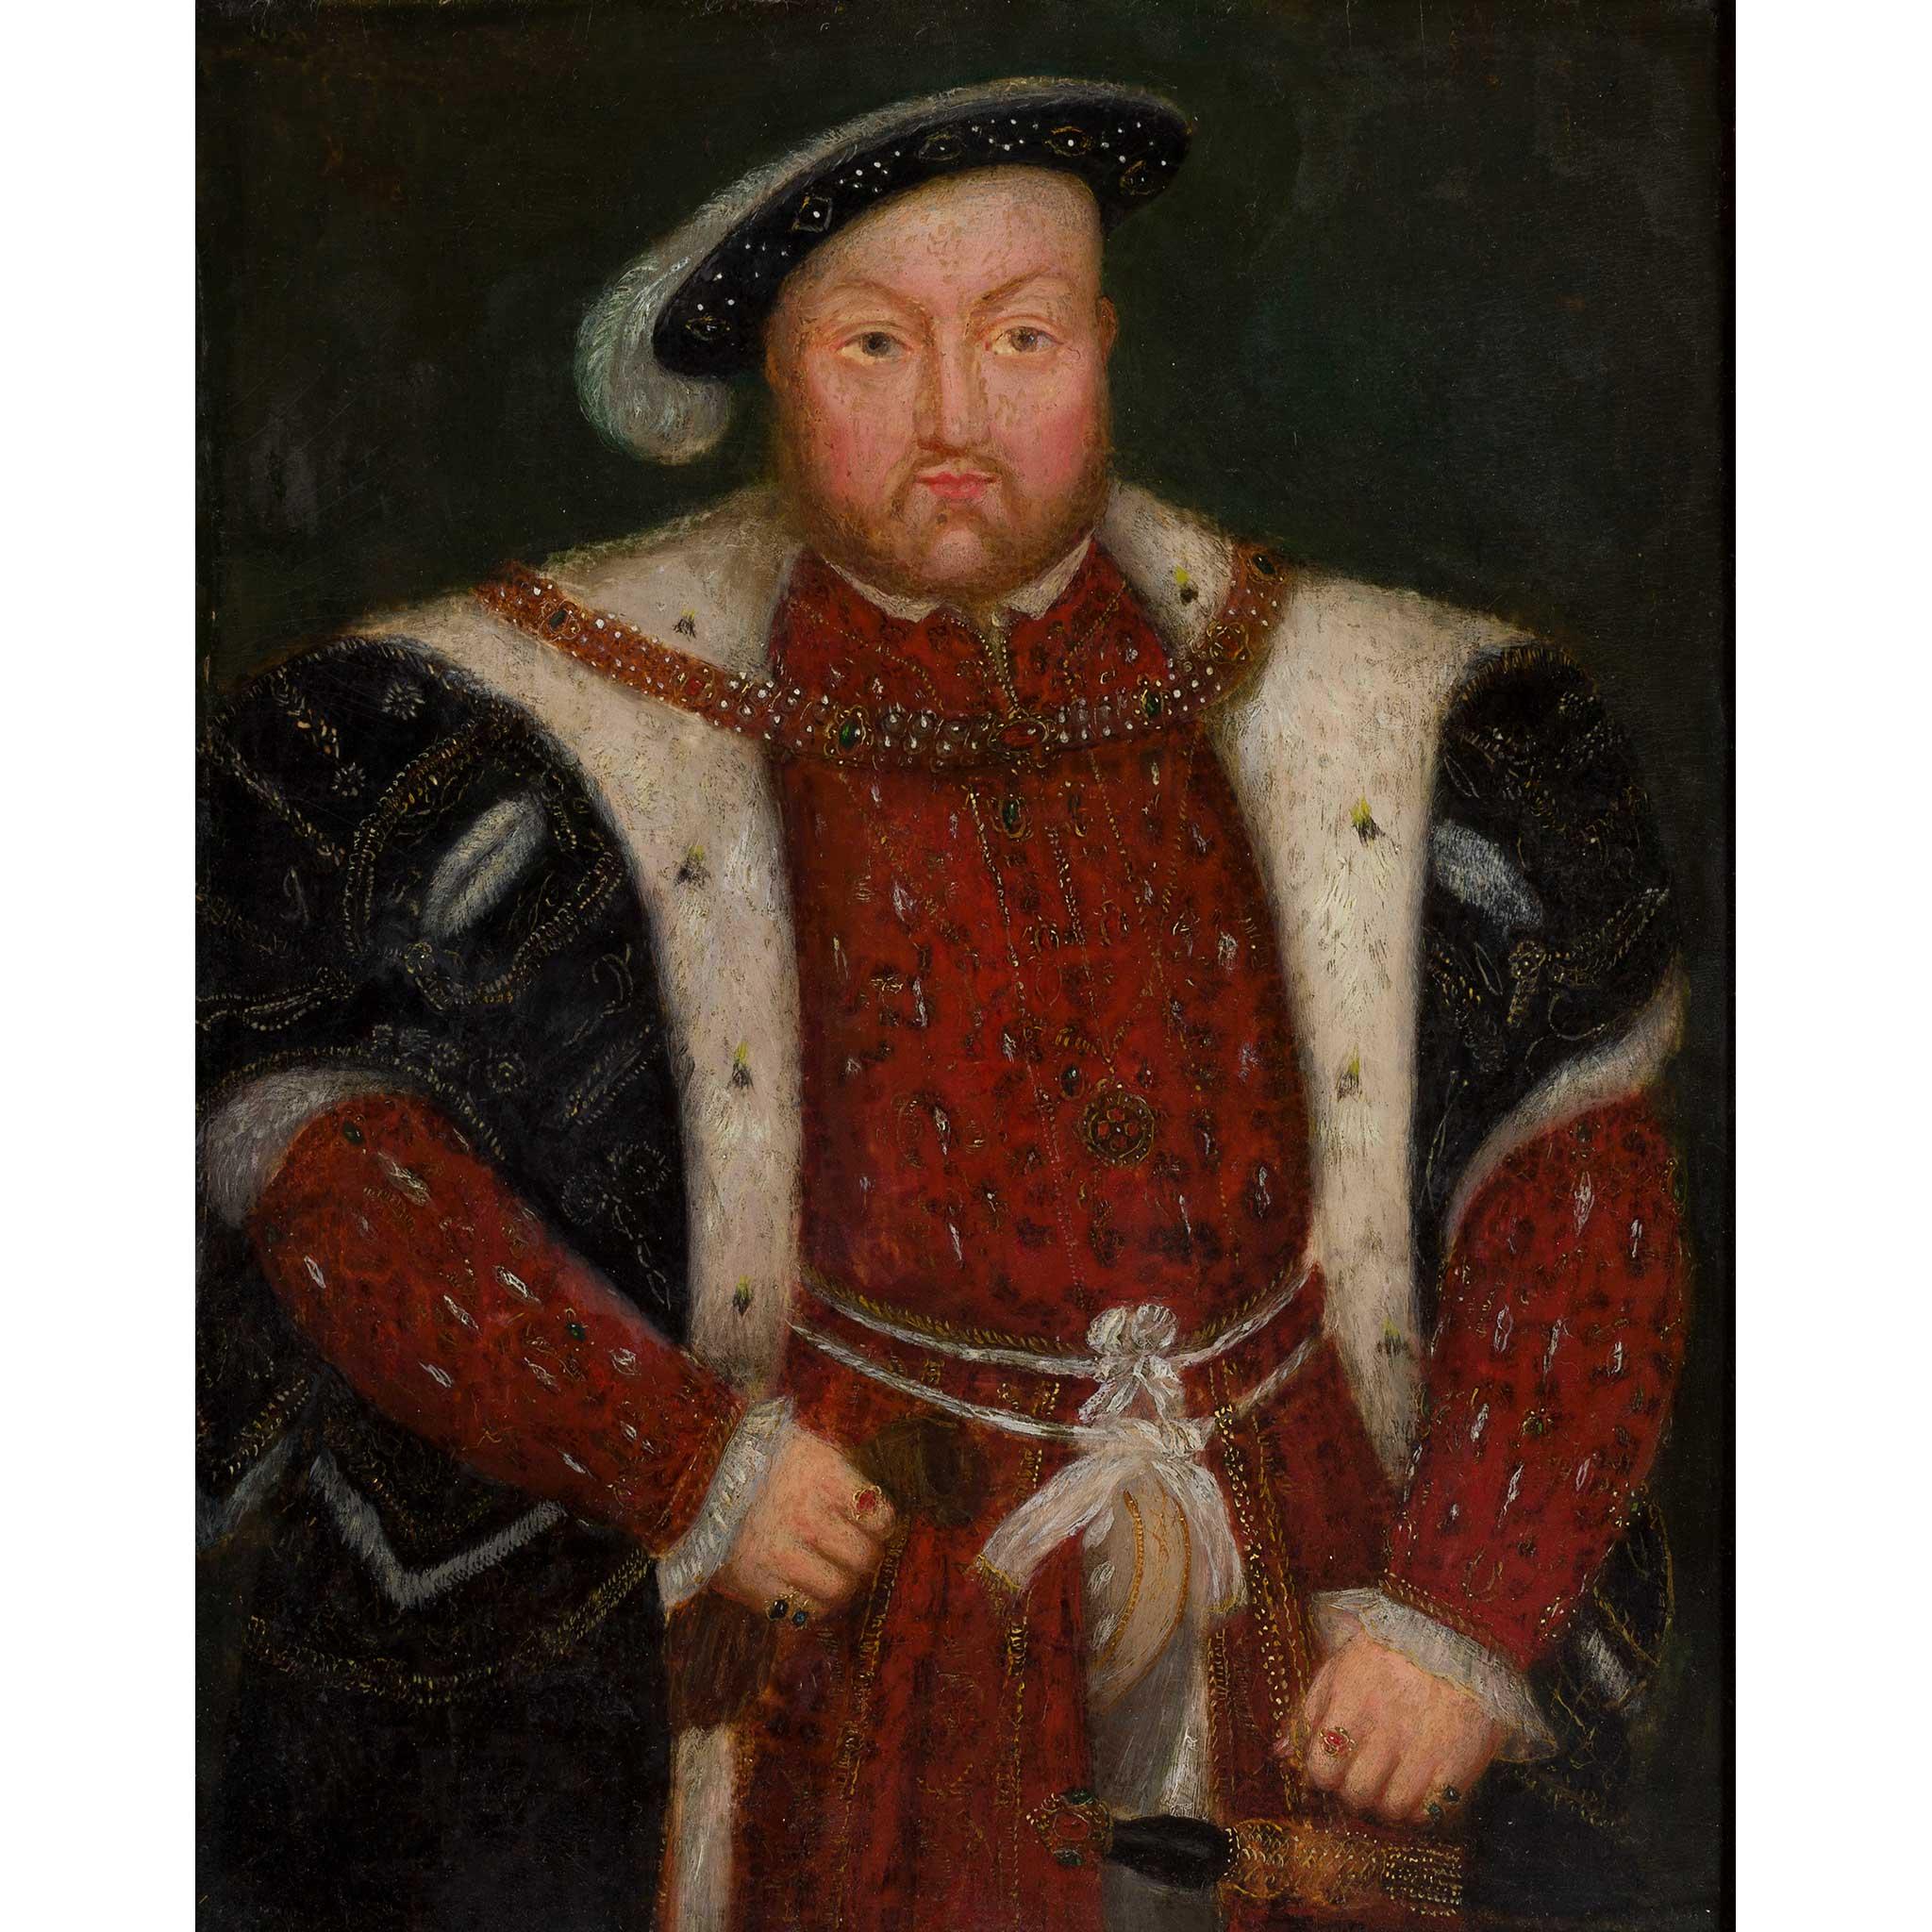 16TH/17TH CENTURY ENGLISH SCHOOL THREE QUARTER LENGTH PORTRAIT OF KING HENRY VIII